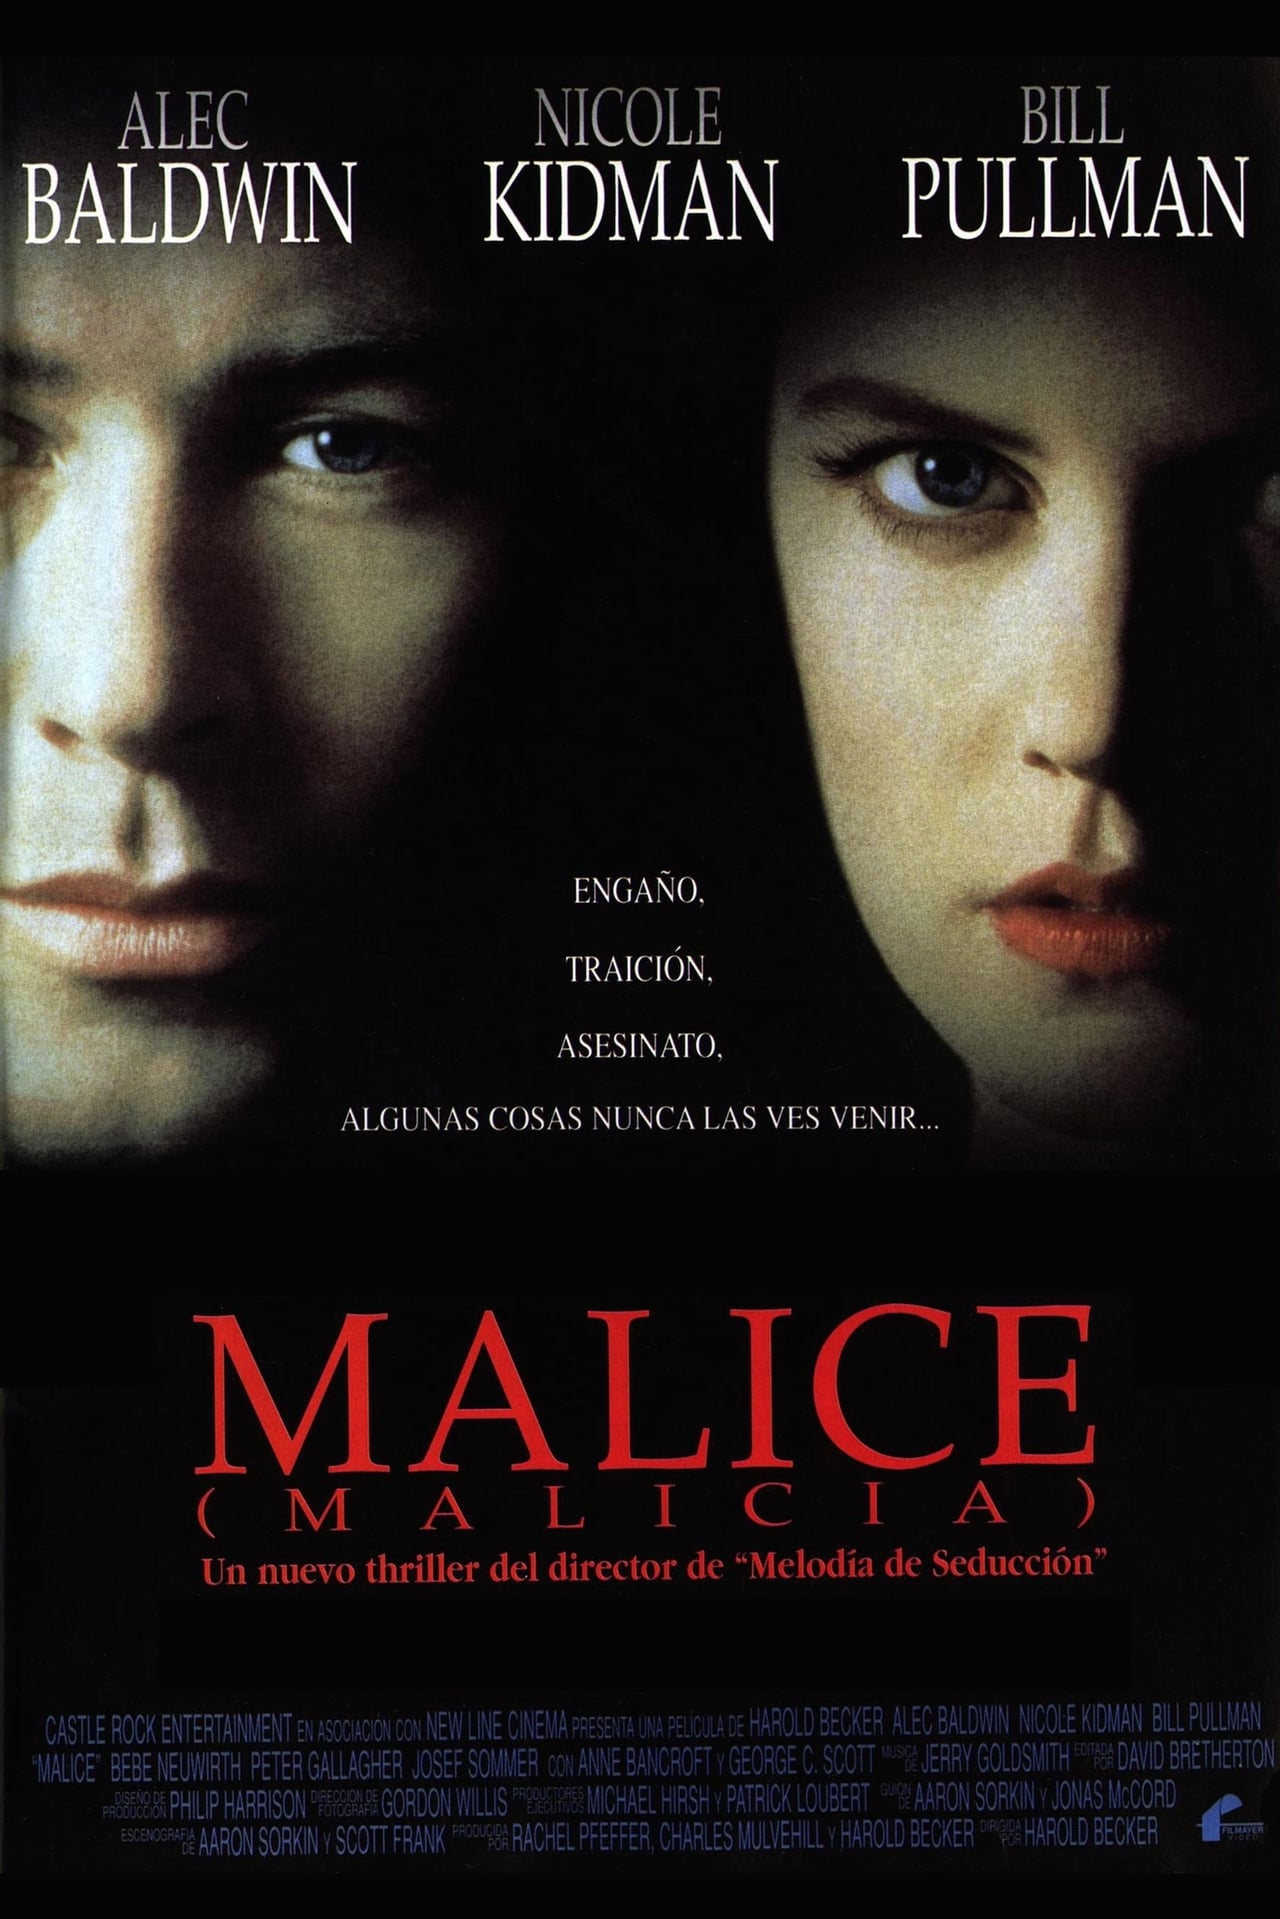 Malice Film